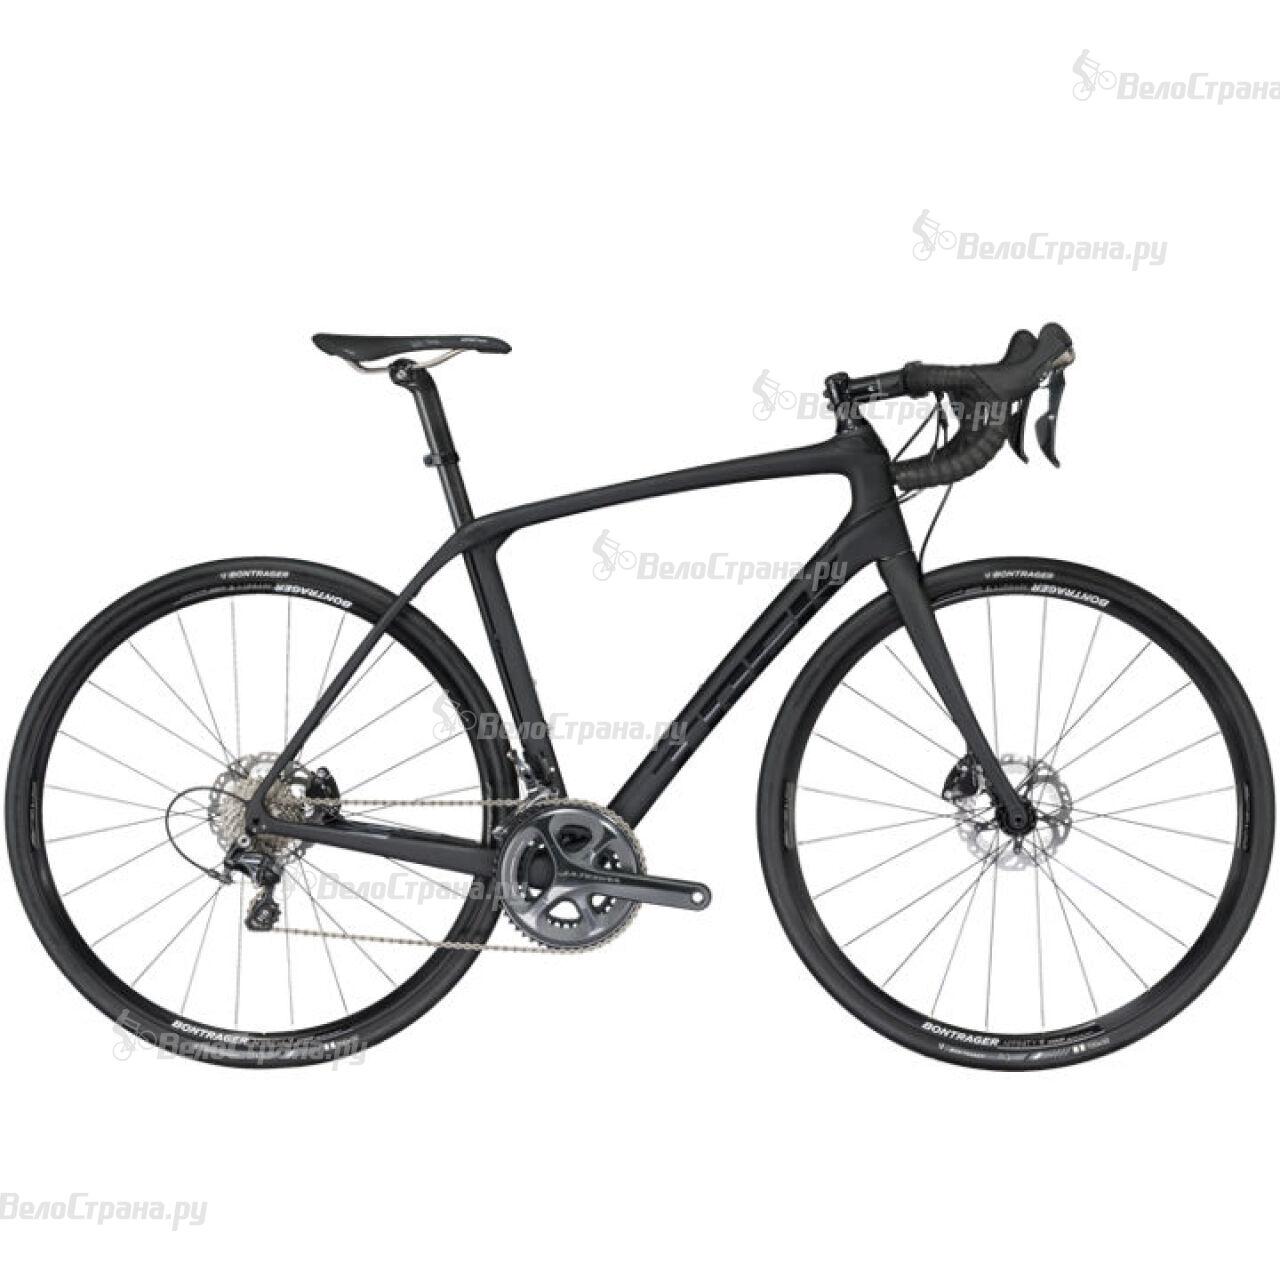 Велосипед Trek Domane SLR 6 Disc (2017) велосипед trek domane alr 4 disc 2017